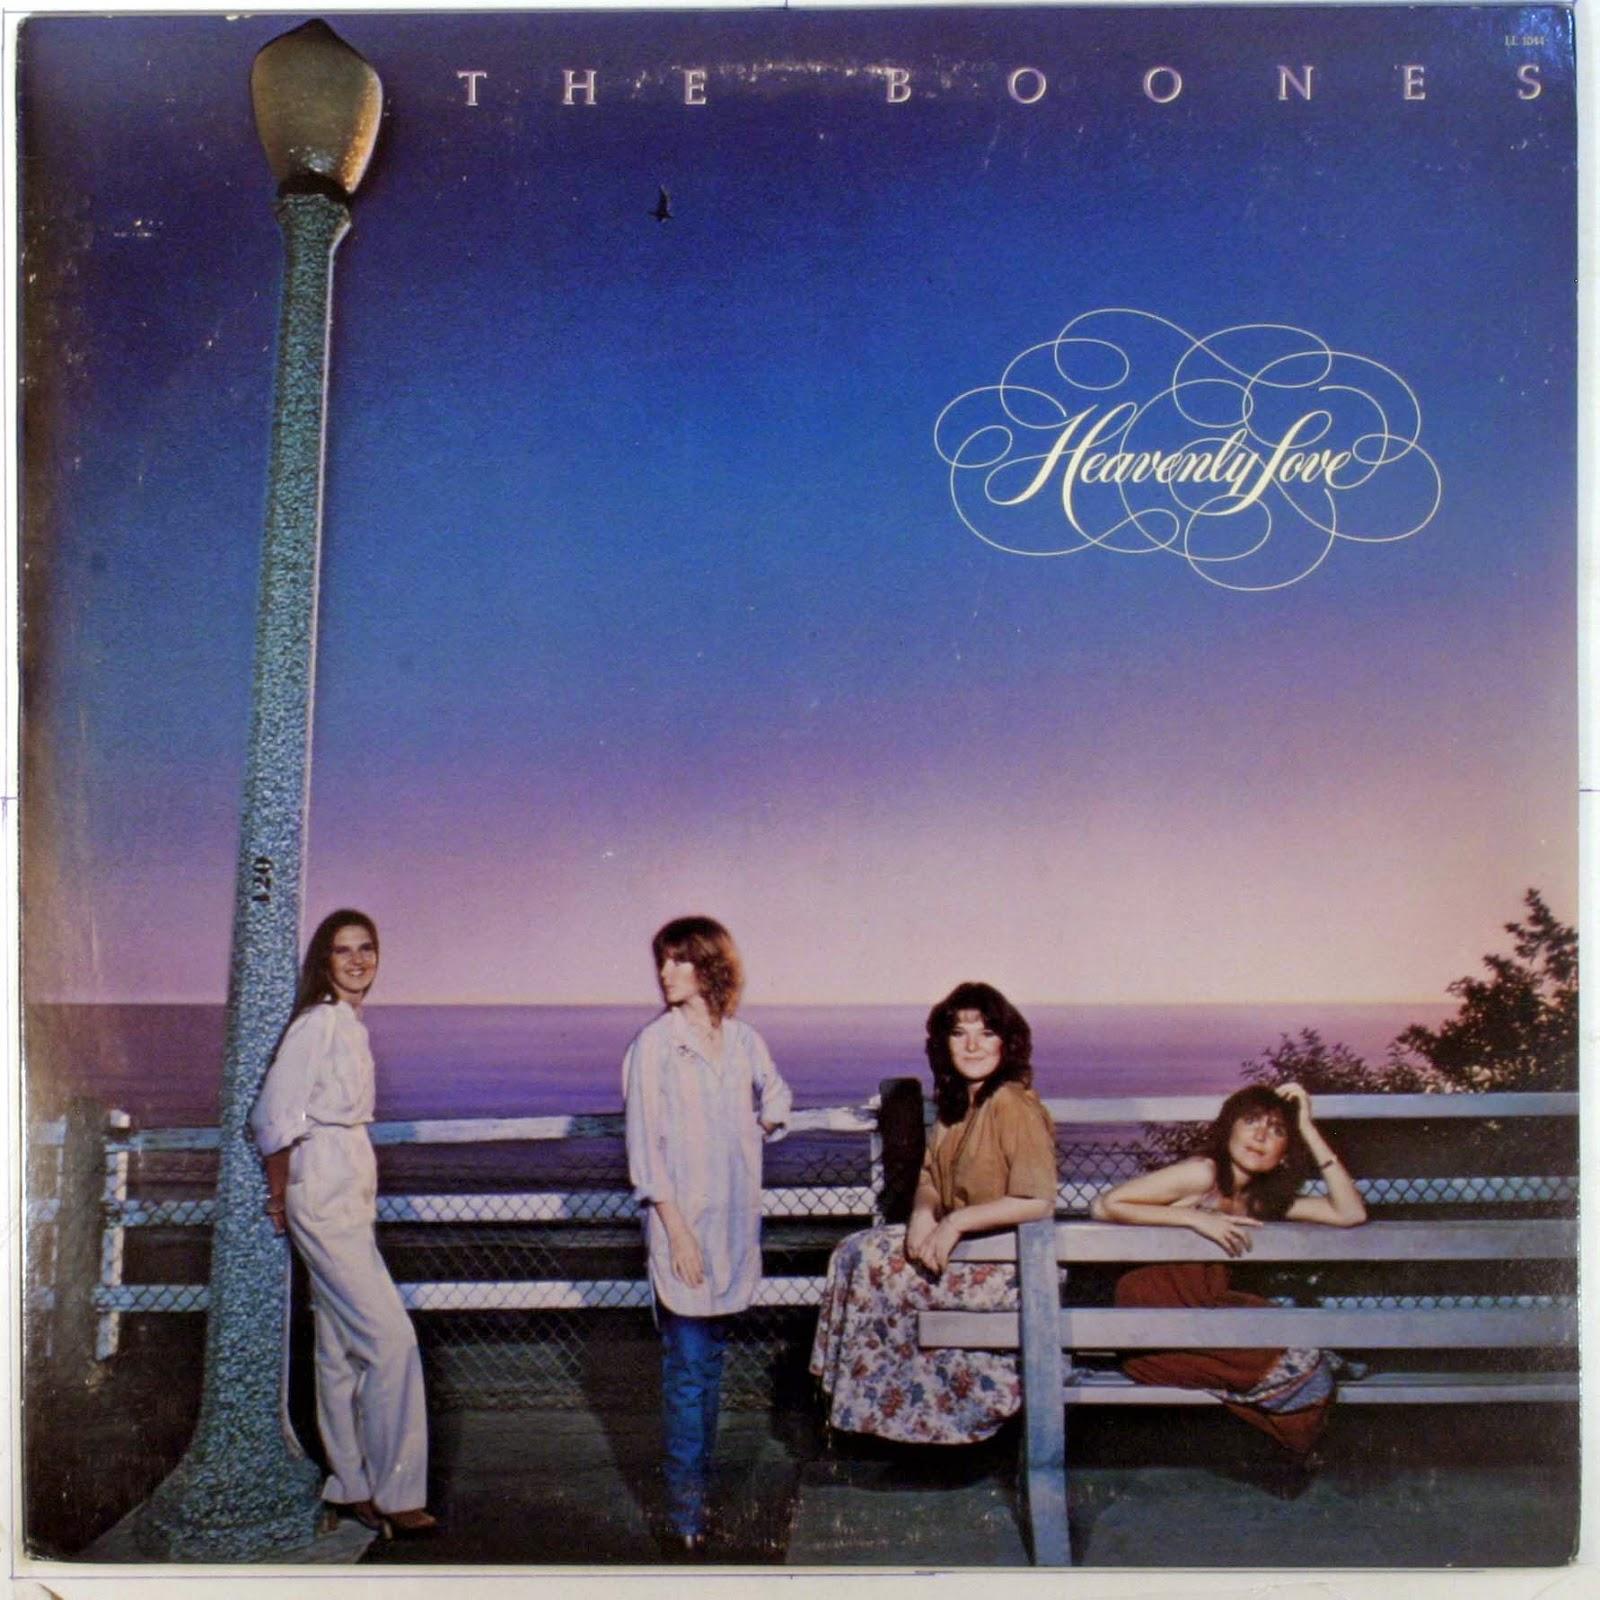 The Boones - Heavenly Love